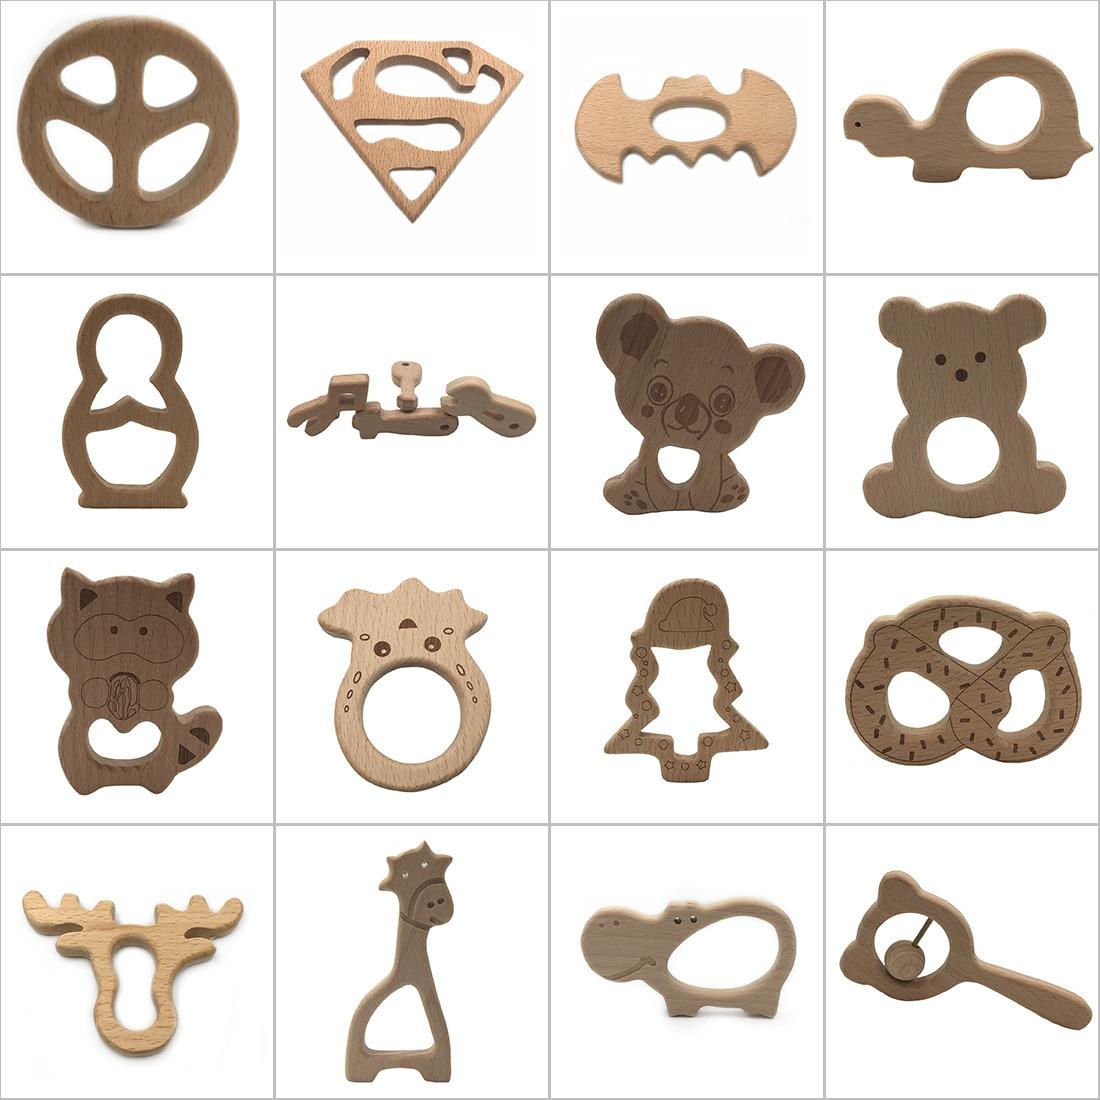 Handmade  Shower Toys Baby Teether Nursing Holder Nature Wooden Animal Shape